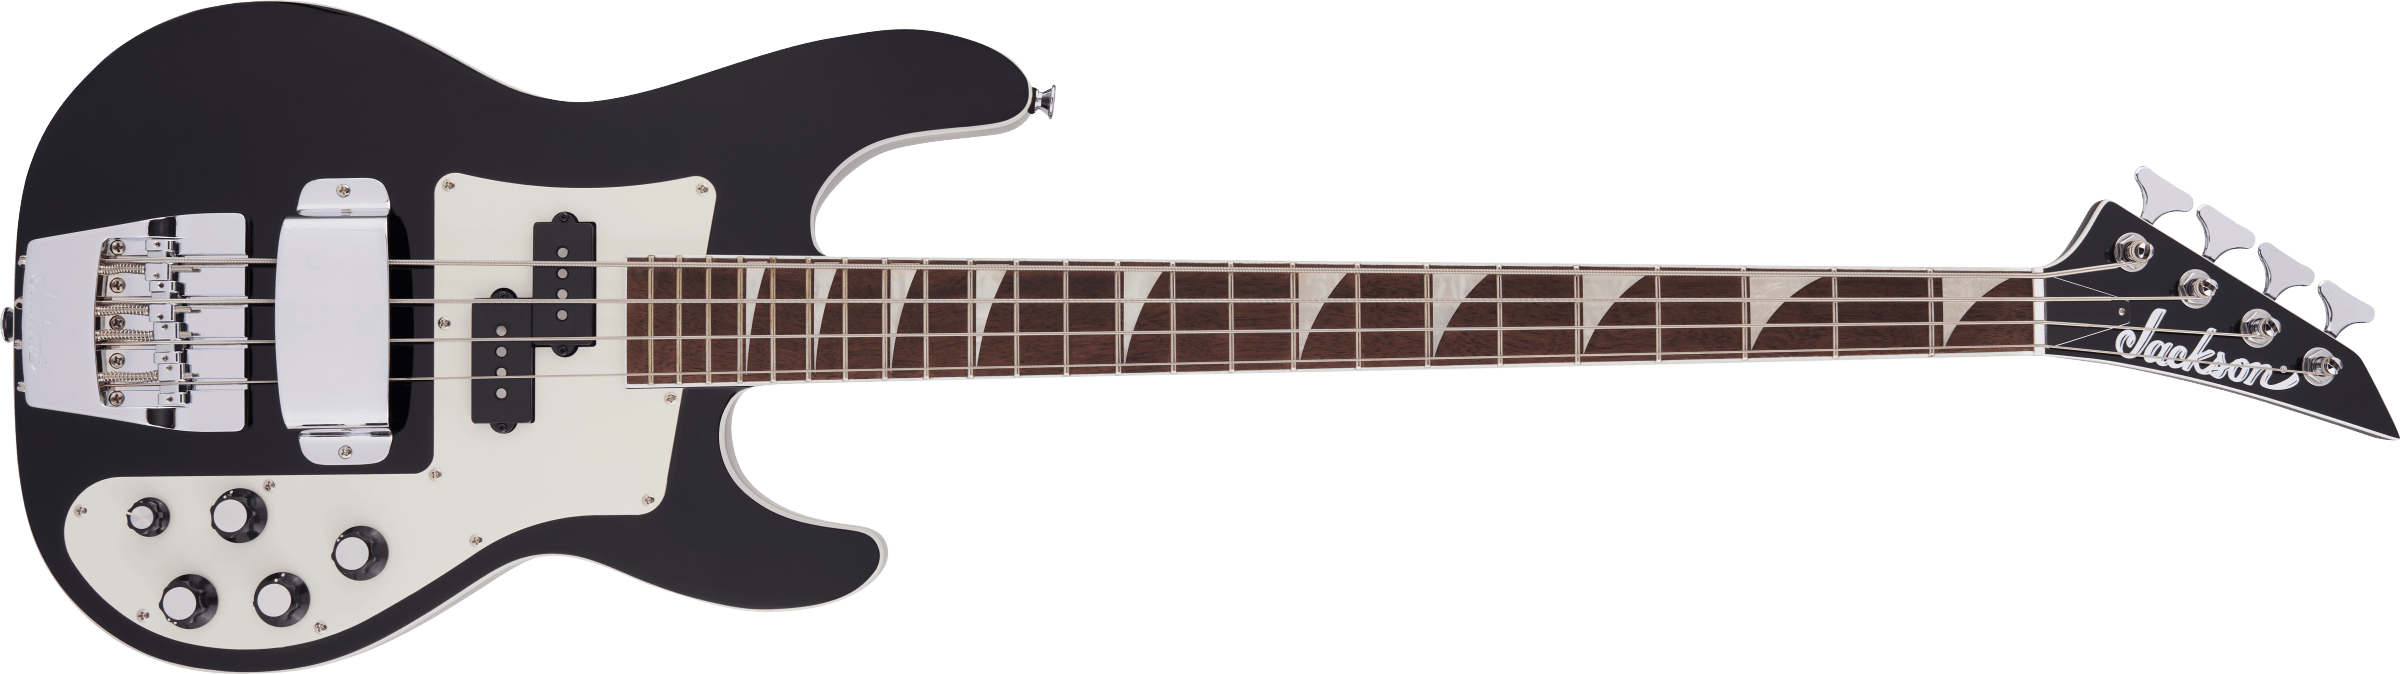 Jolana D Bass - O Rickenbacker do Leste! 2916654603_jac_ins_frt_01_rr